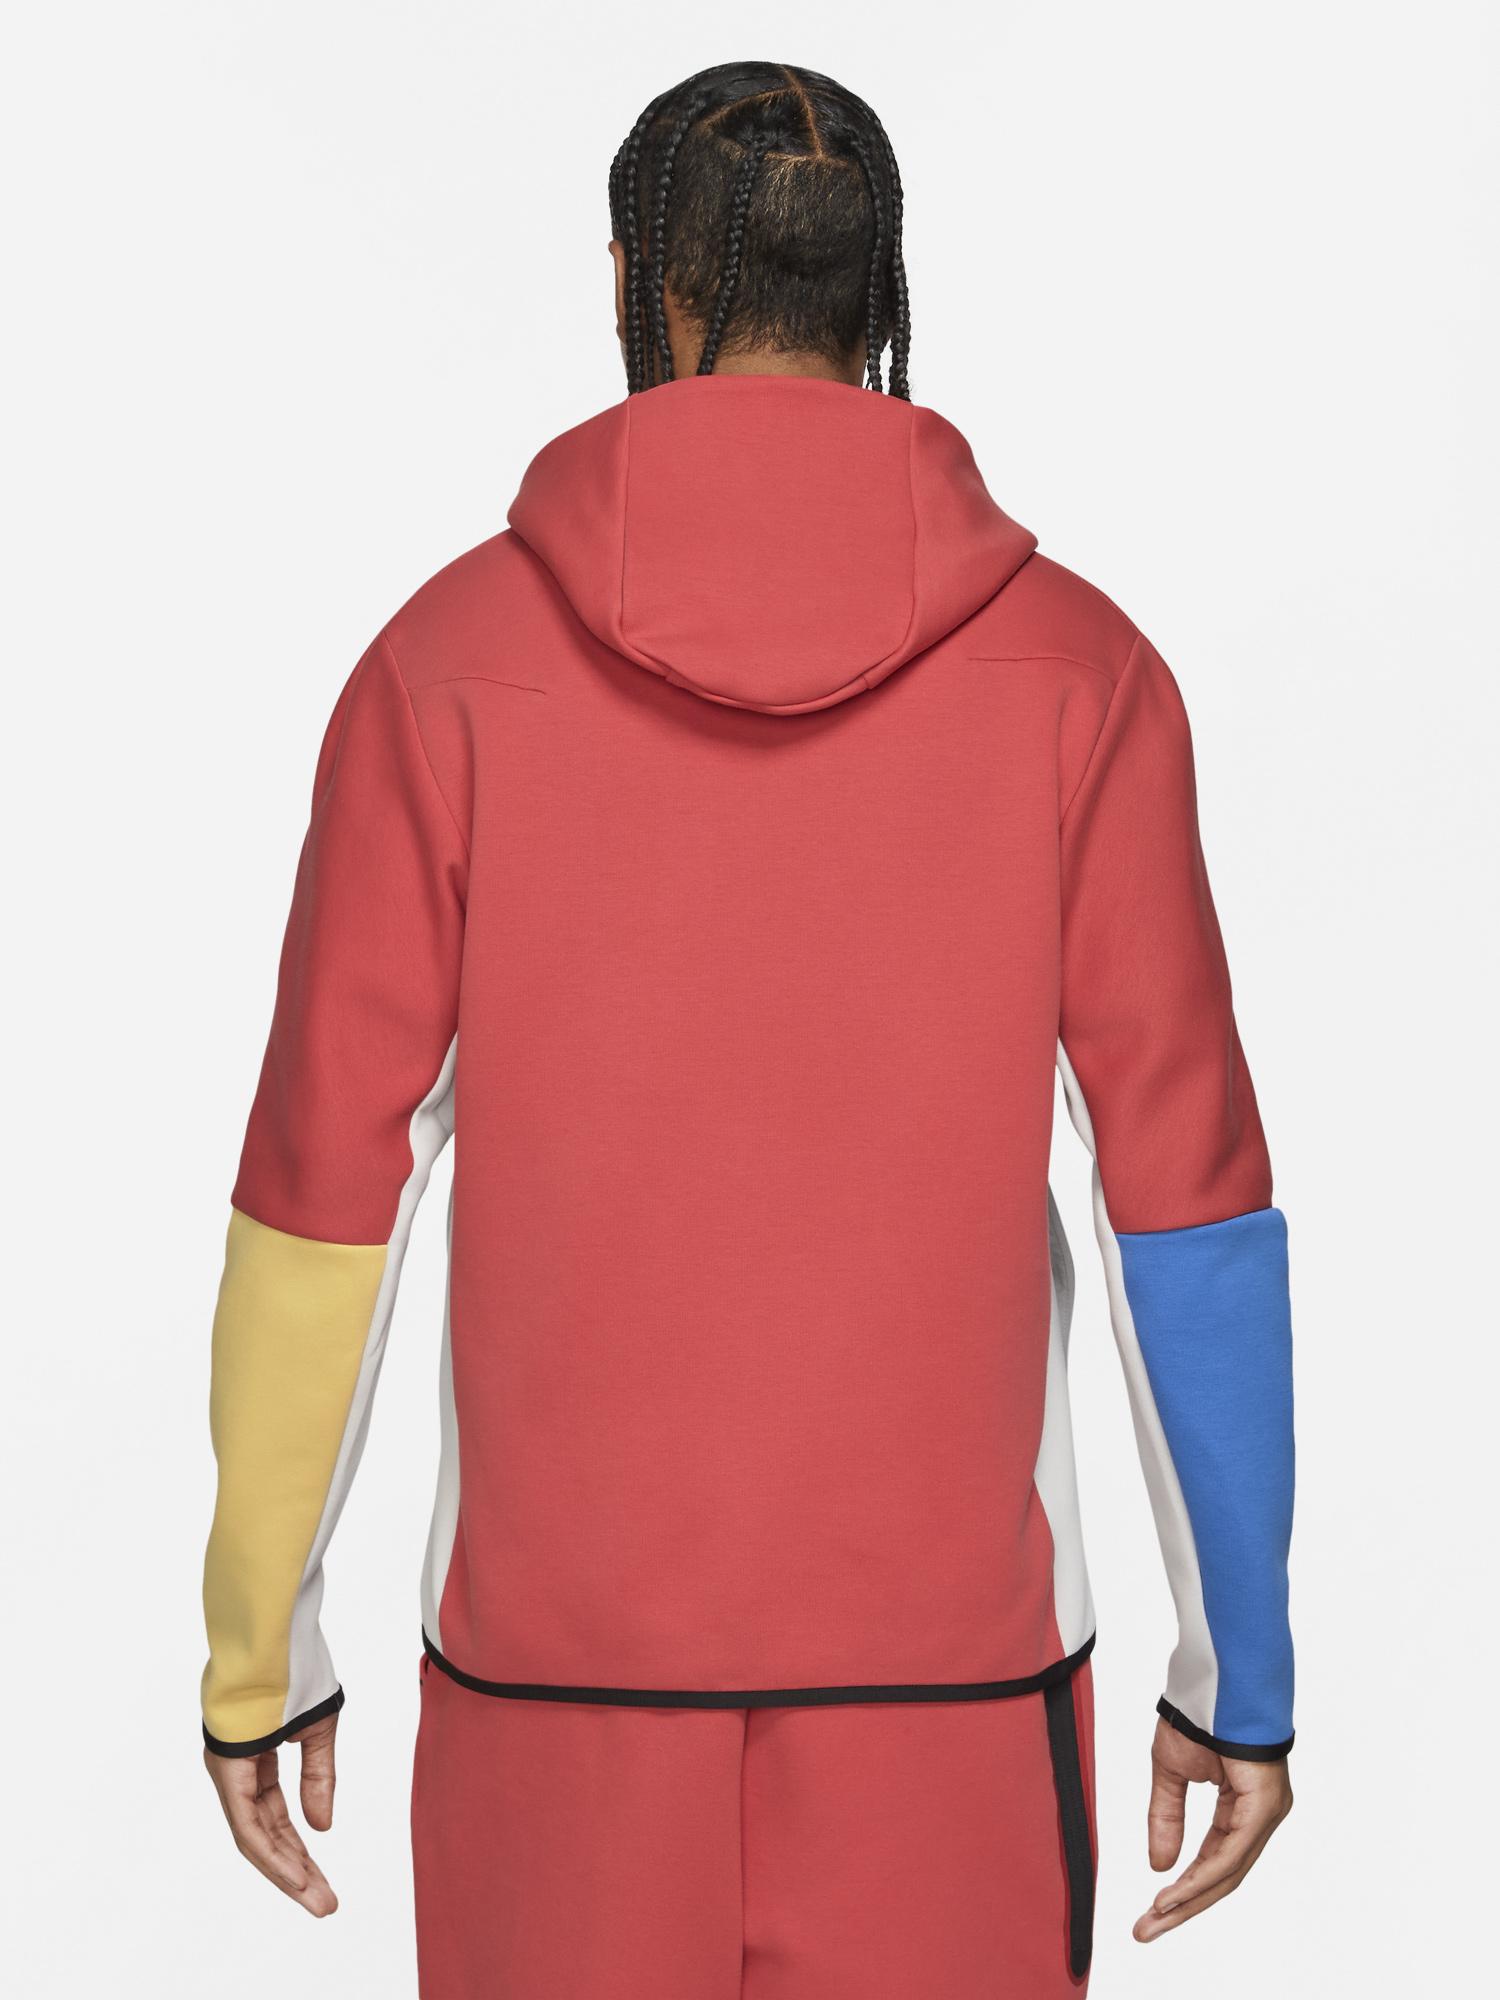 nike-tech-fleece-multicolor-hoodie-red-blue-yellow-2